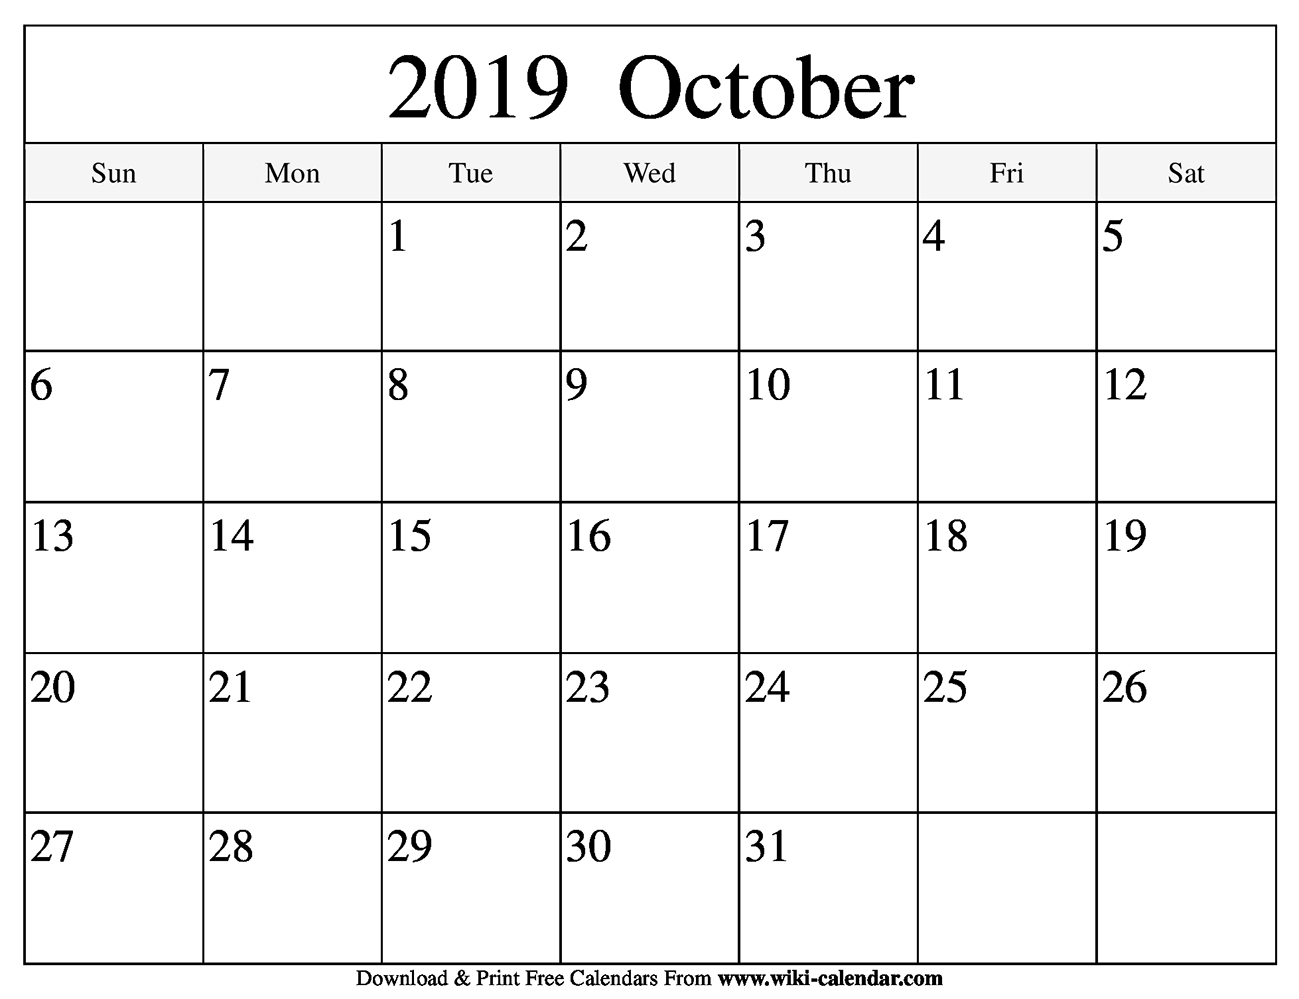 Blank October 2019 Calendar Printable throughout Calendar Blanks August Through October 2019